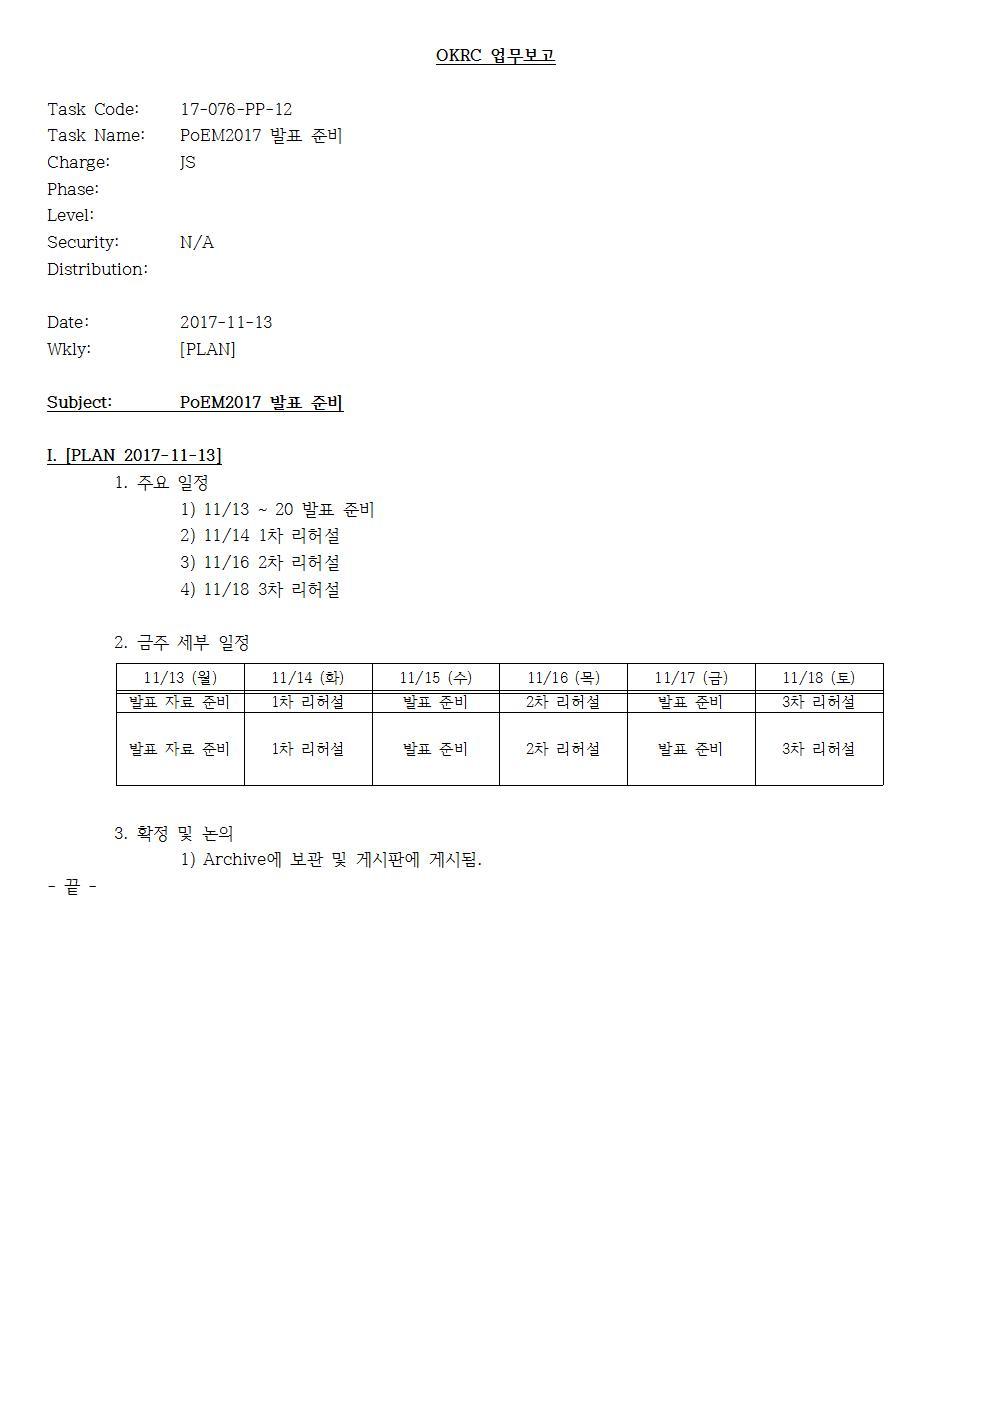 D-[17-076-PP-12]-[PoEM2017-P]-[JS]-[2017-11-13]-[PLAN]001.jpg